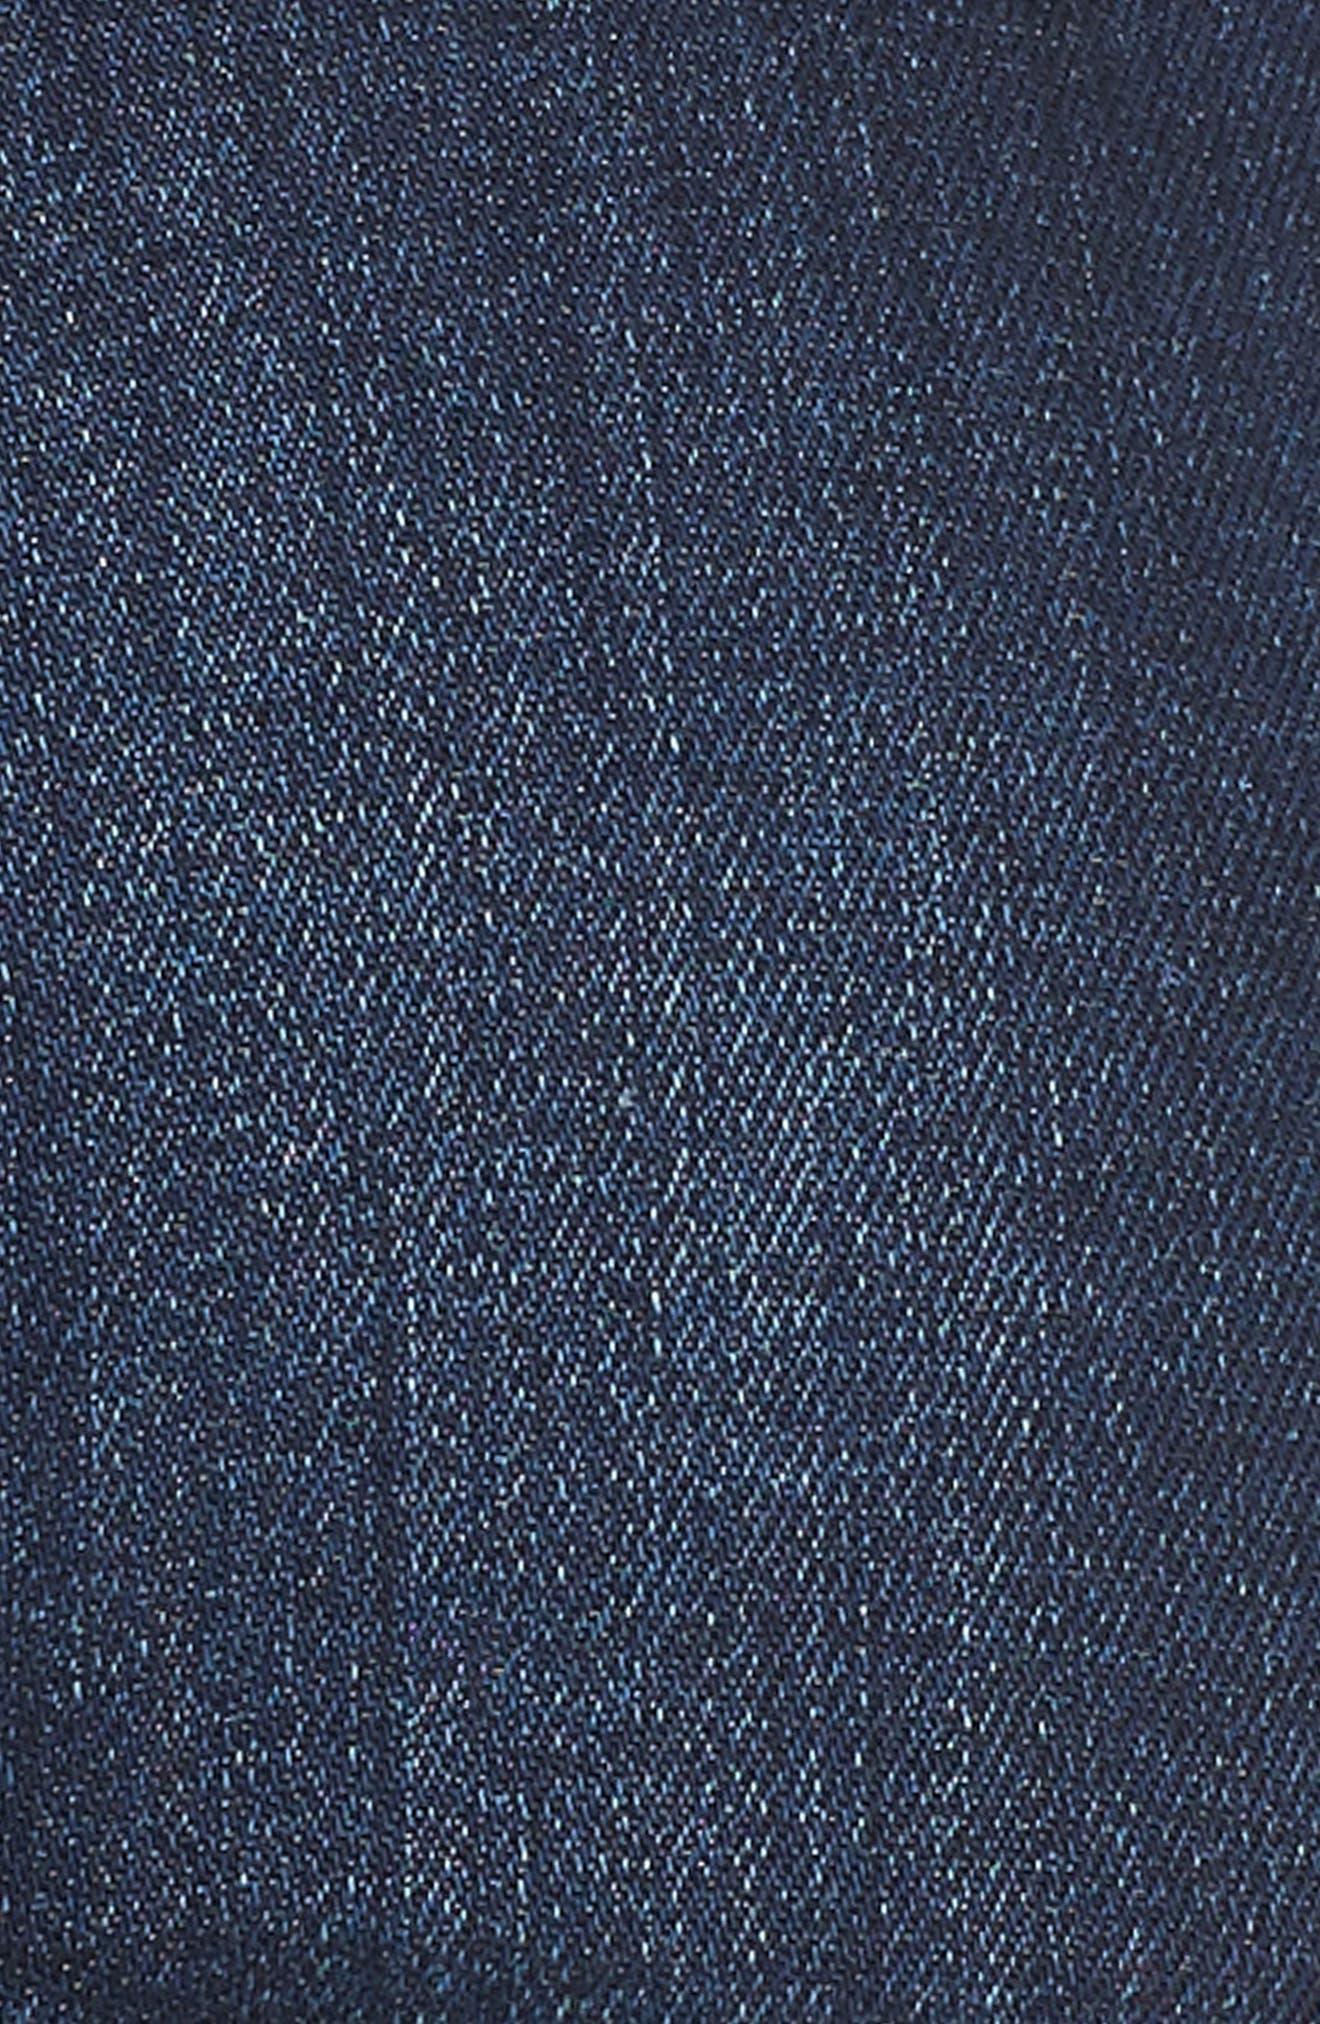 Alissa Skinny Jeans,                             Alternate thumbnail 6, color,                             400